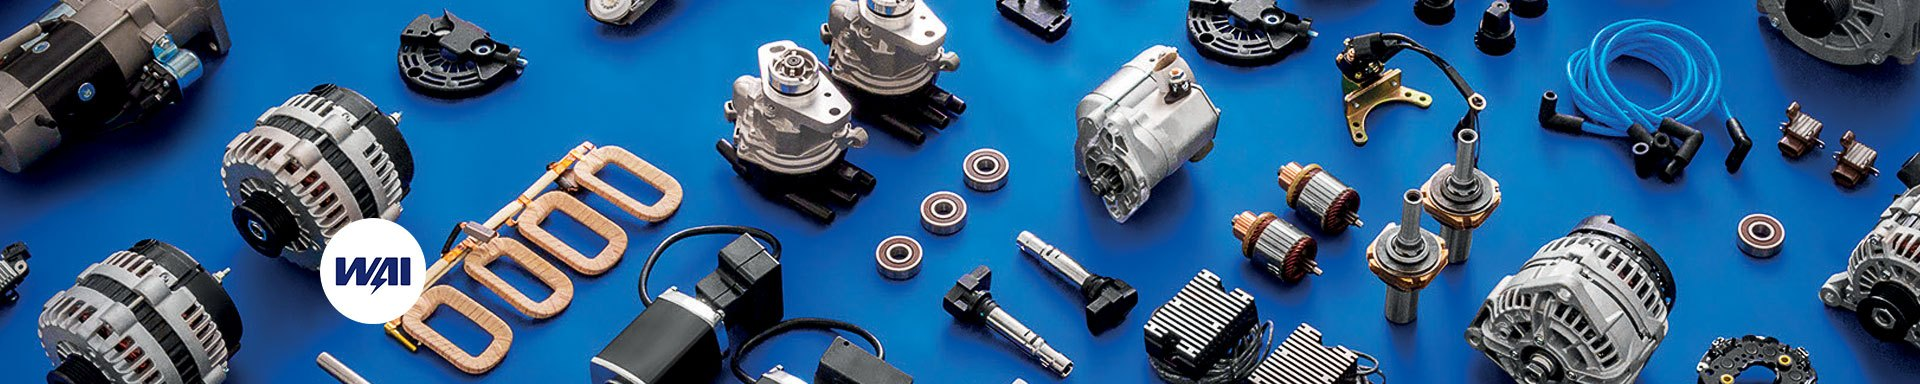 World Power Systems CAMS2602 Engine Camshaft Synchronizer